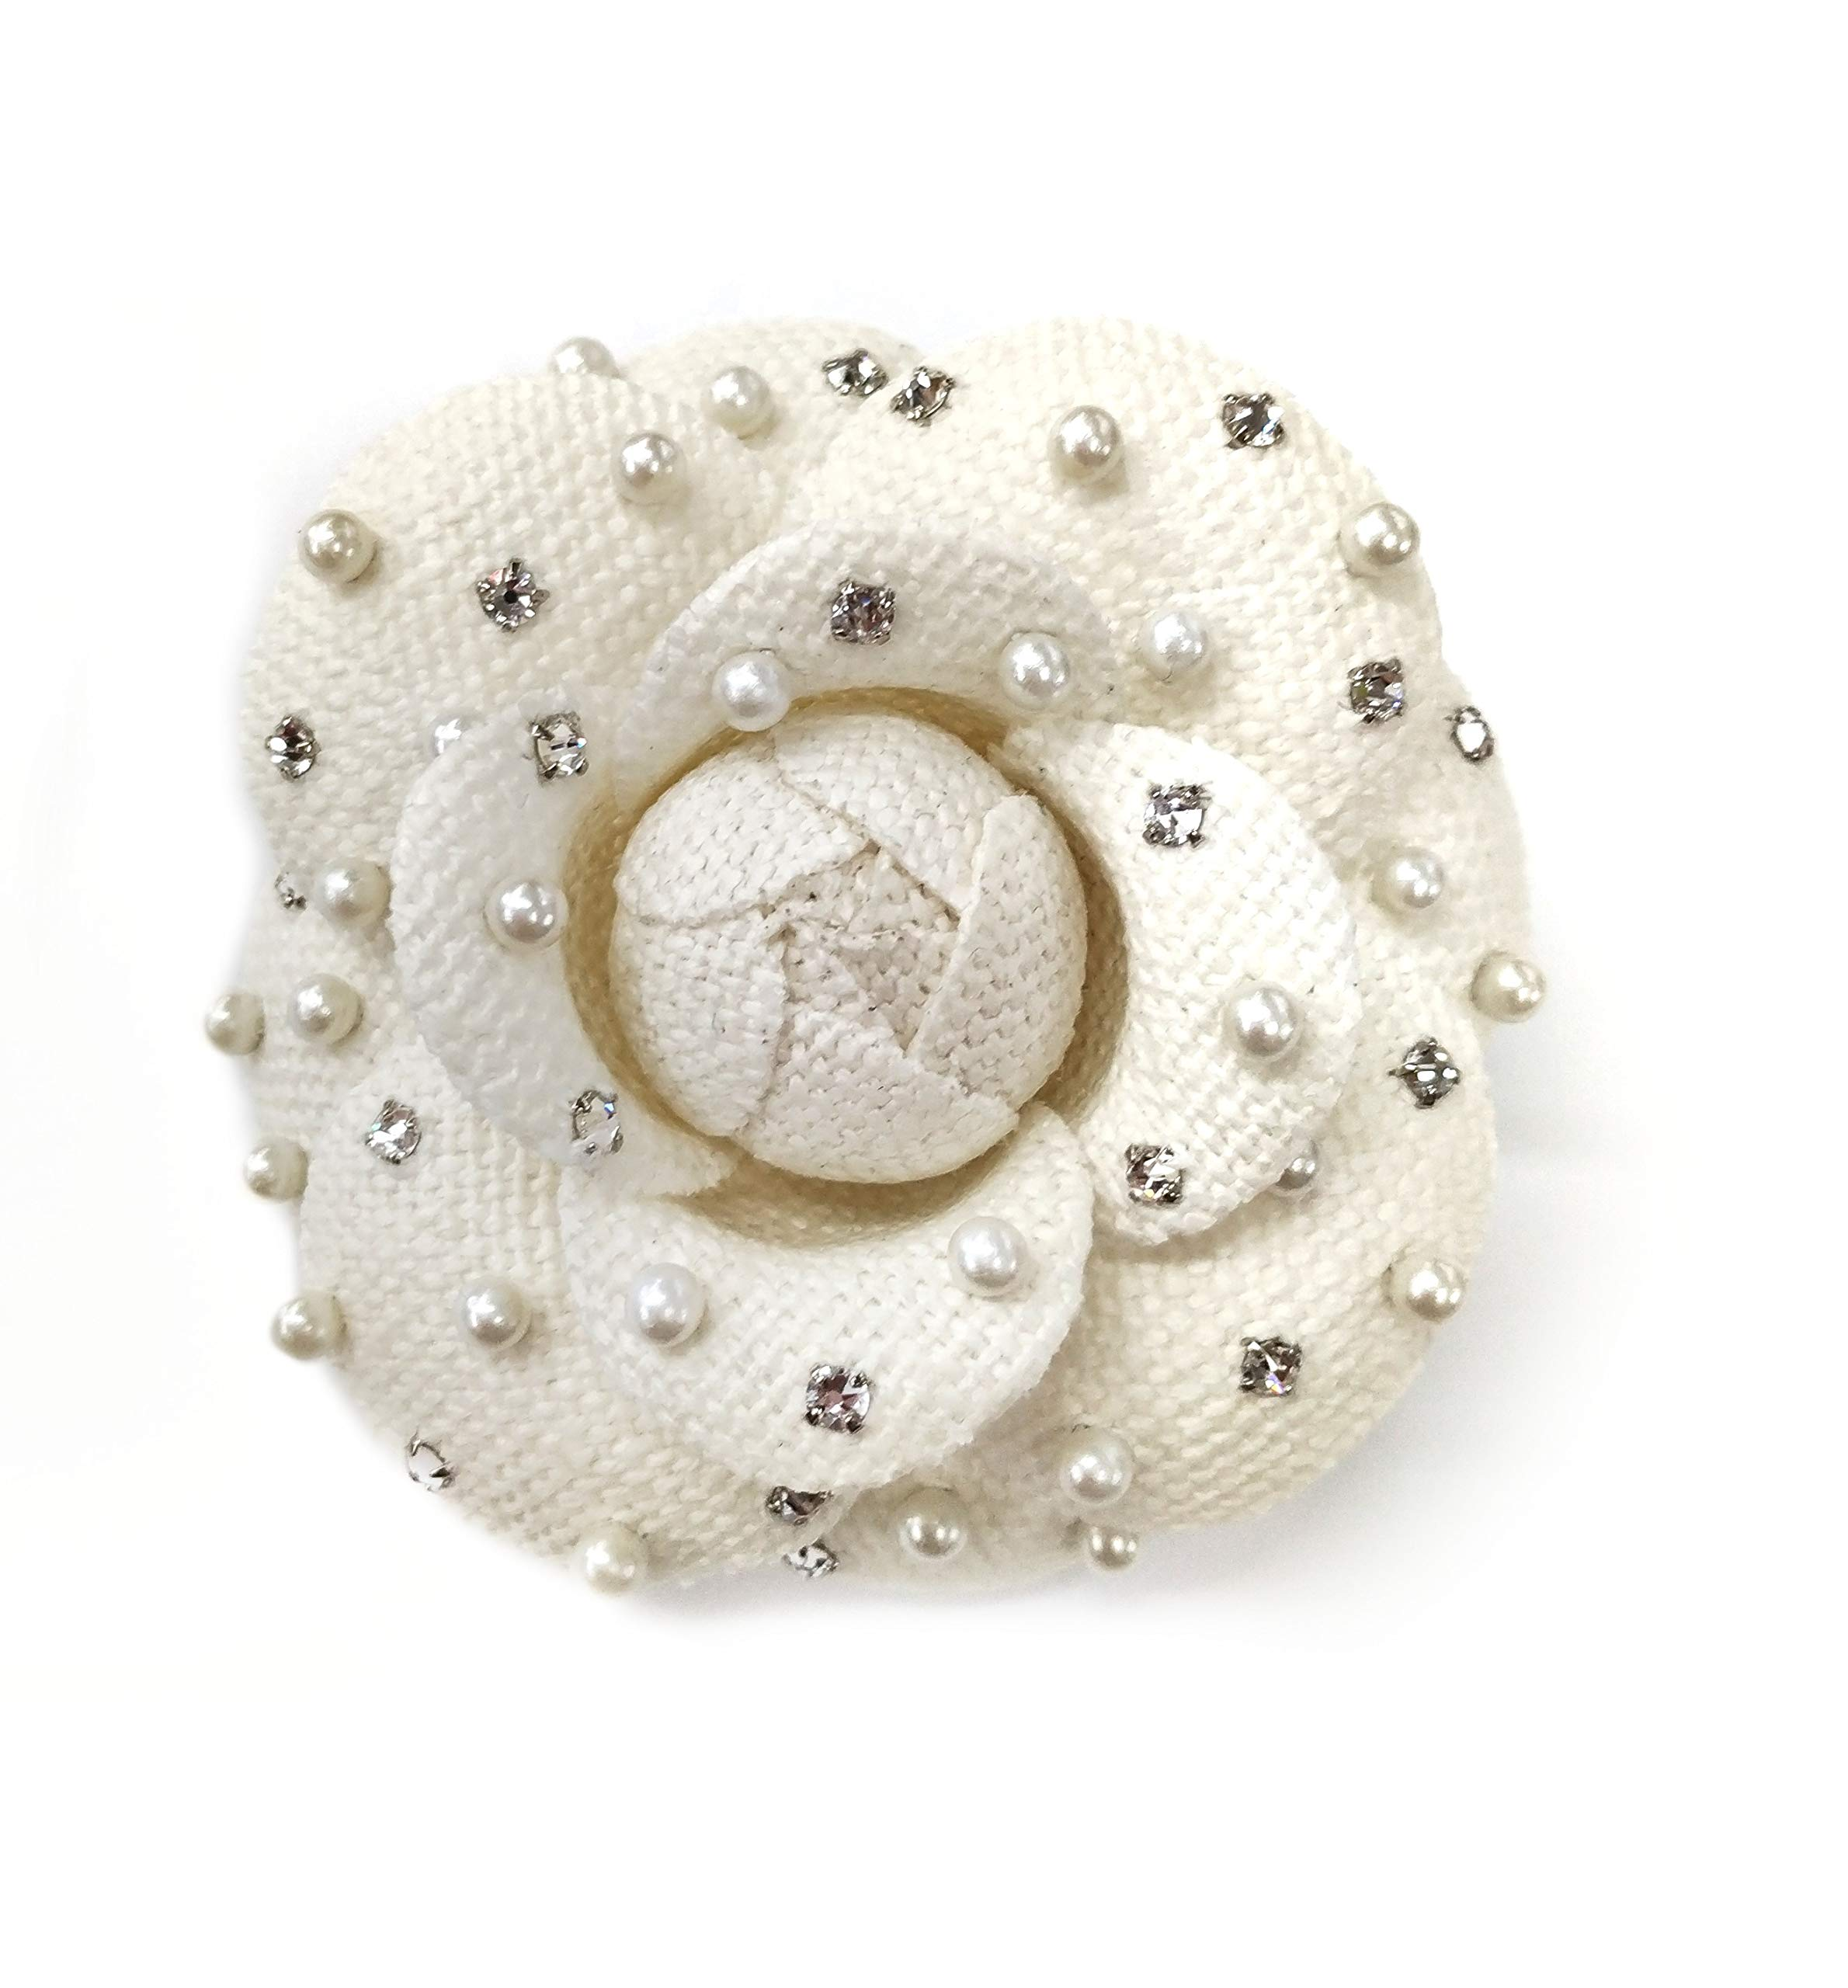 M&S Schmalberg Camellia Pearl and Swarovski Crystal Silk Fabric Flower Pin Brooch - Hand-Made in New York's Garment Center (American Made) (Silk Linen)